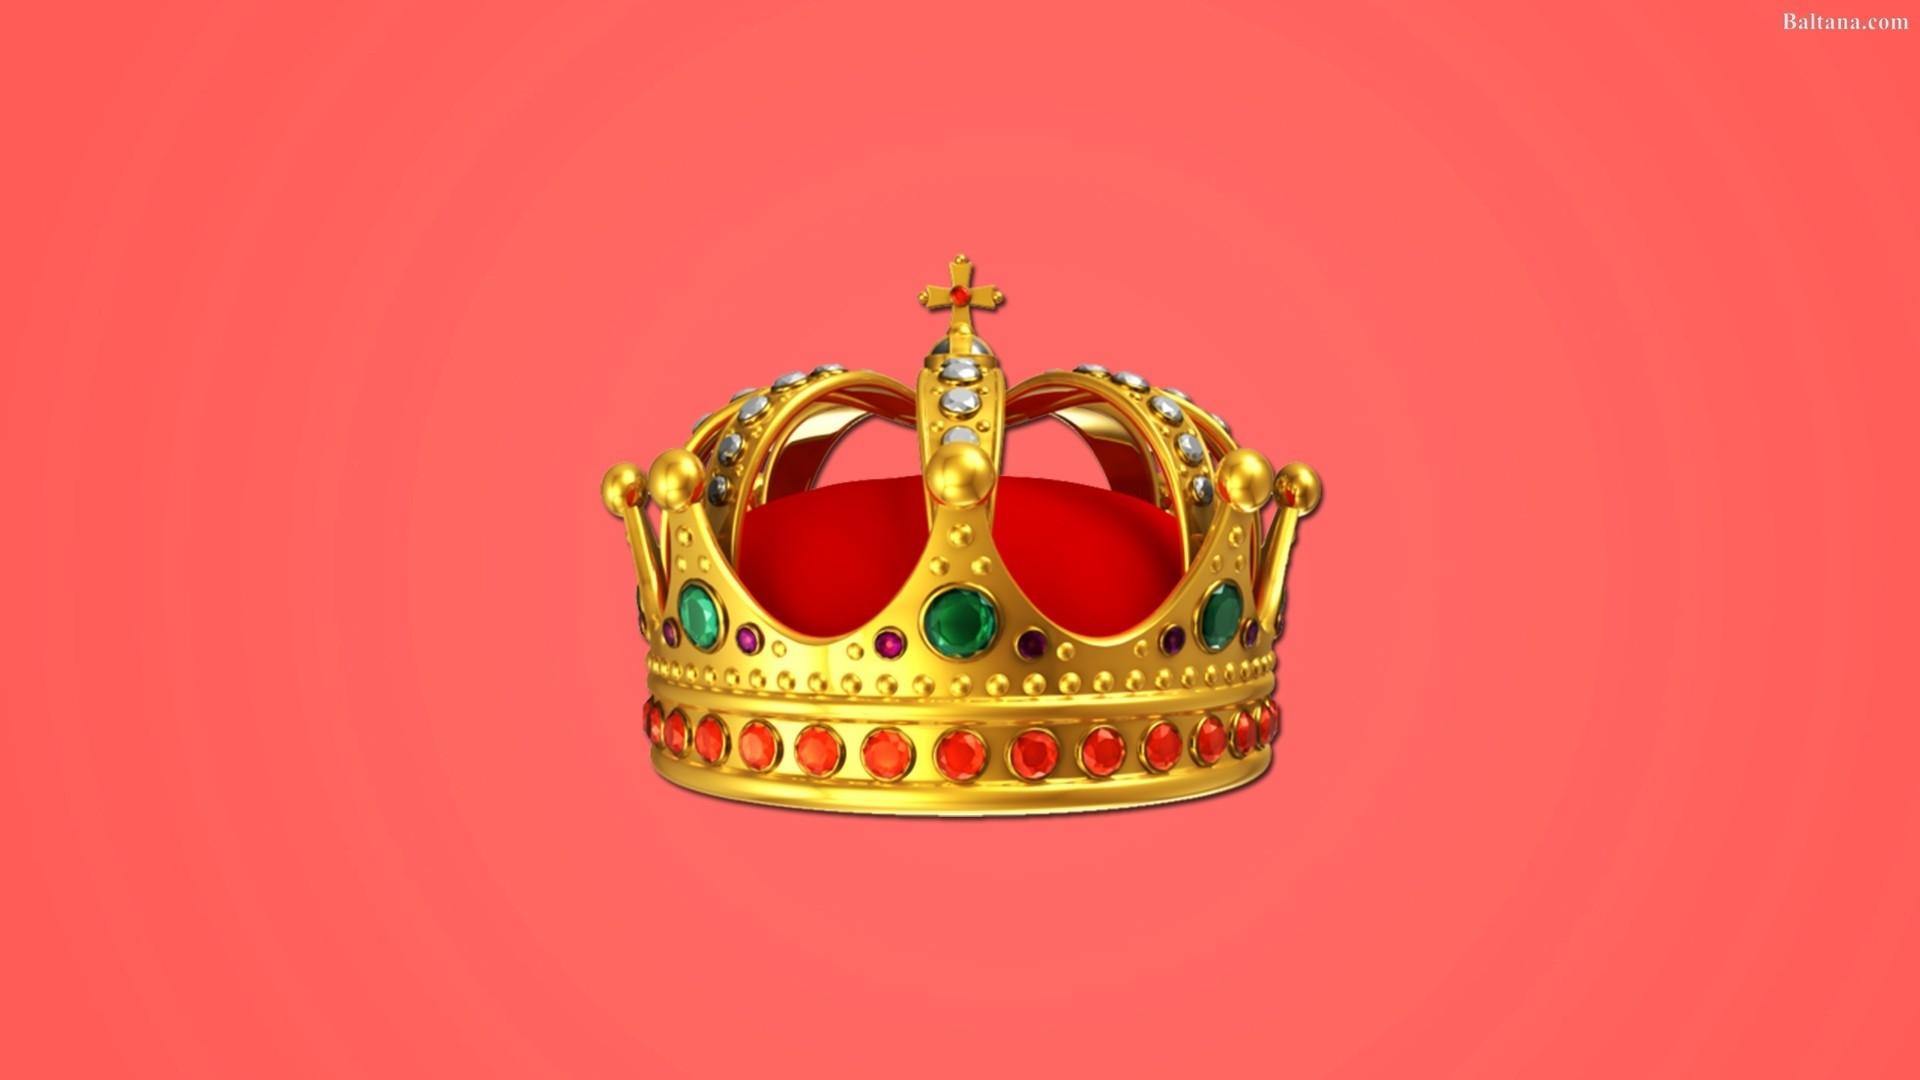 Crown Desktop wallpaper